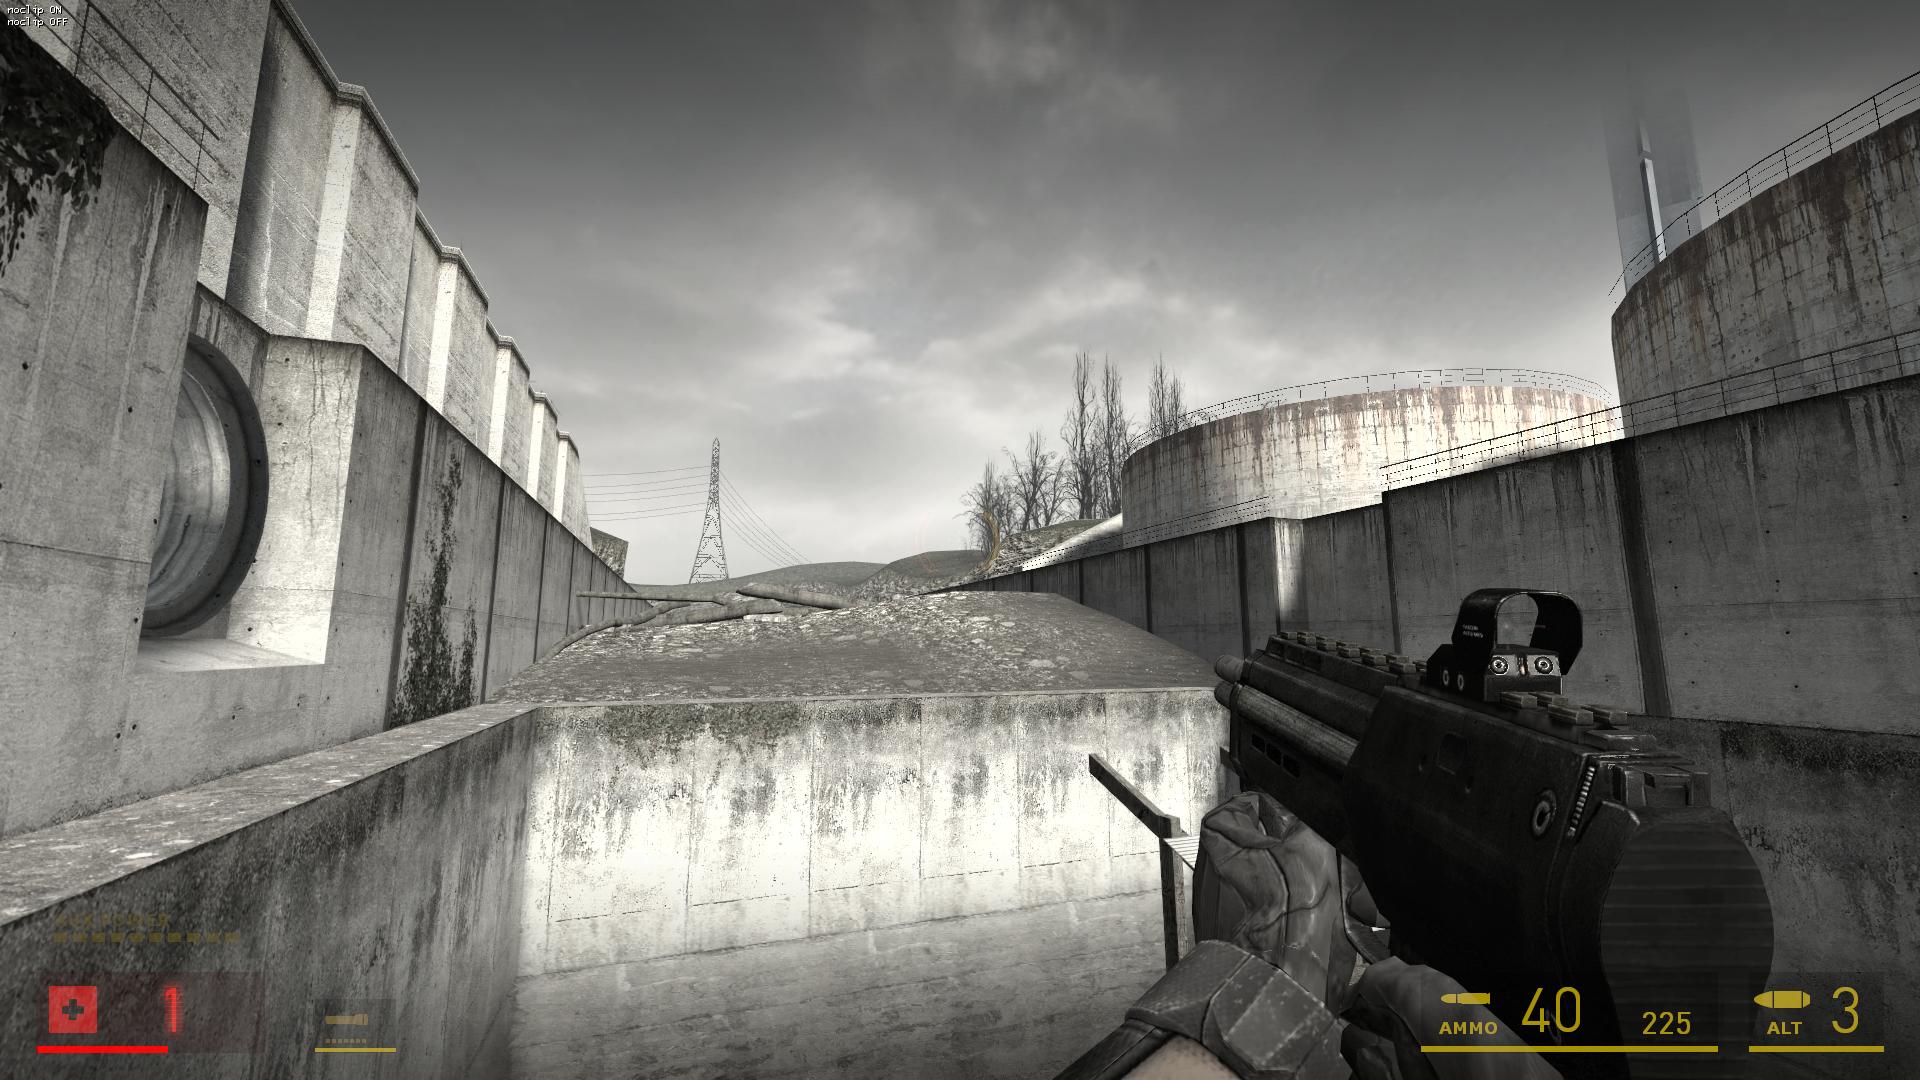 Grayscale - Water Hazard image - Half-Life 2: Plus mod for